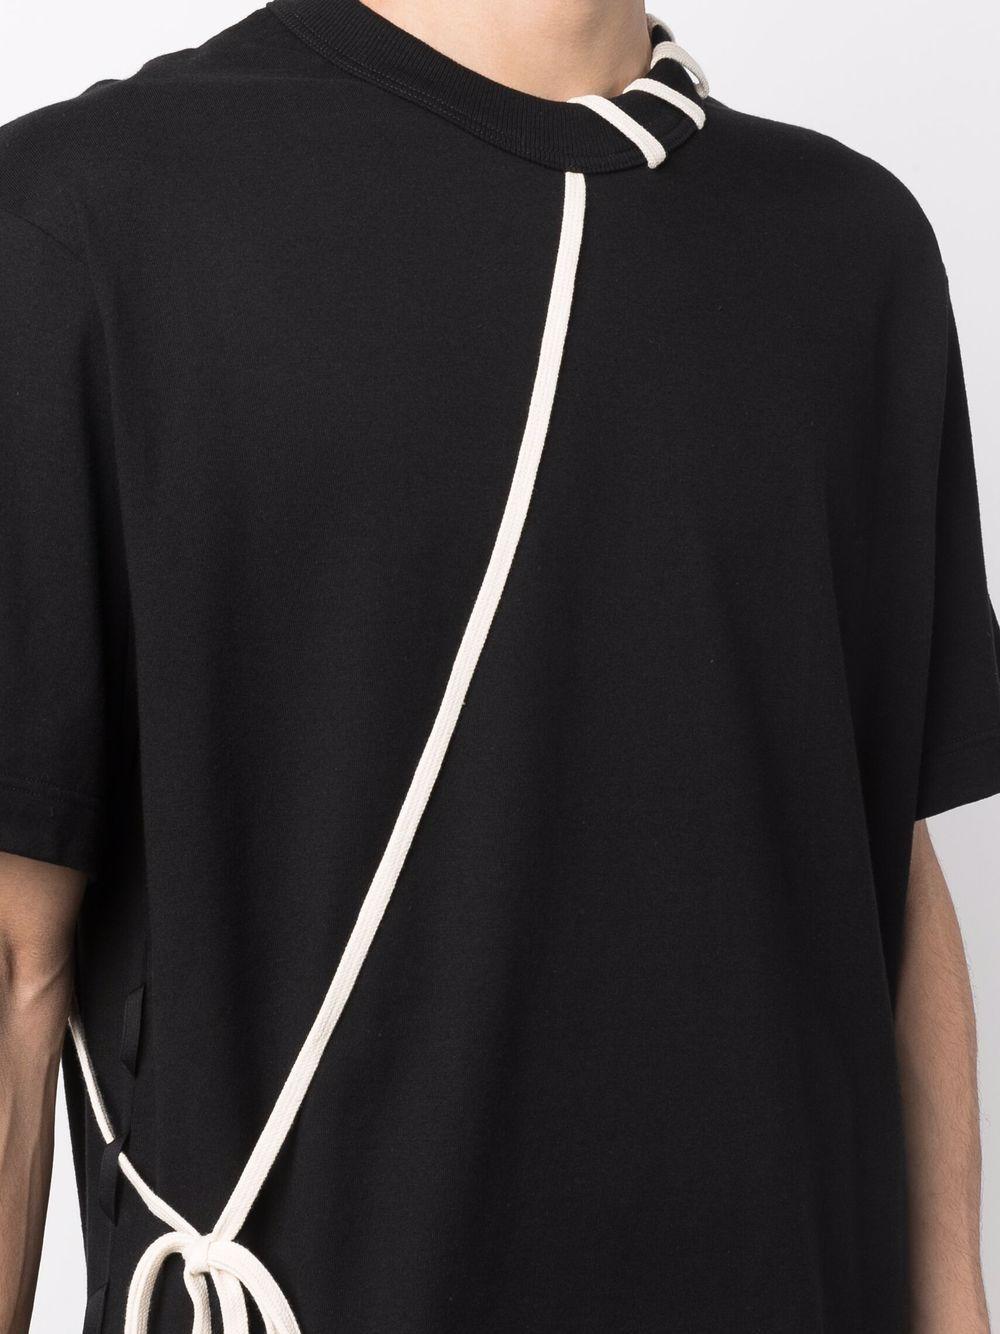 t-shirt con laccio uomo nera in cotone CRAIG GREEN | T-shirt | CGAW21CJETSS01